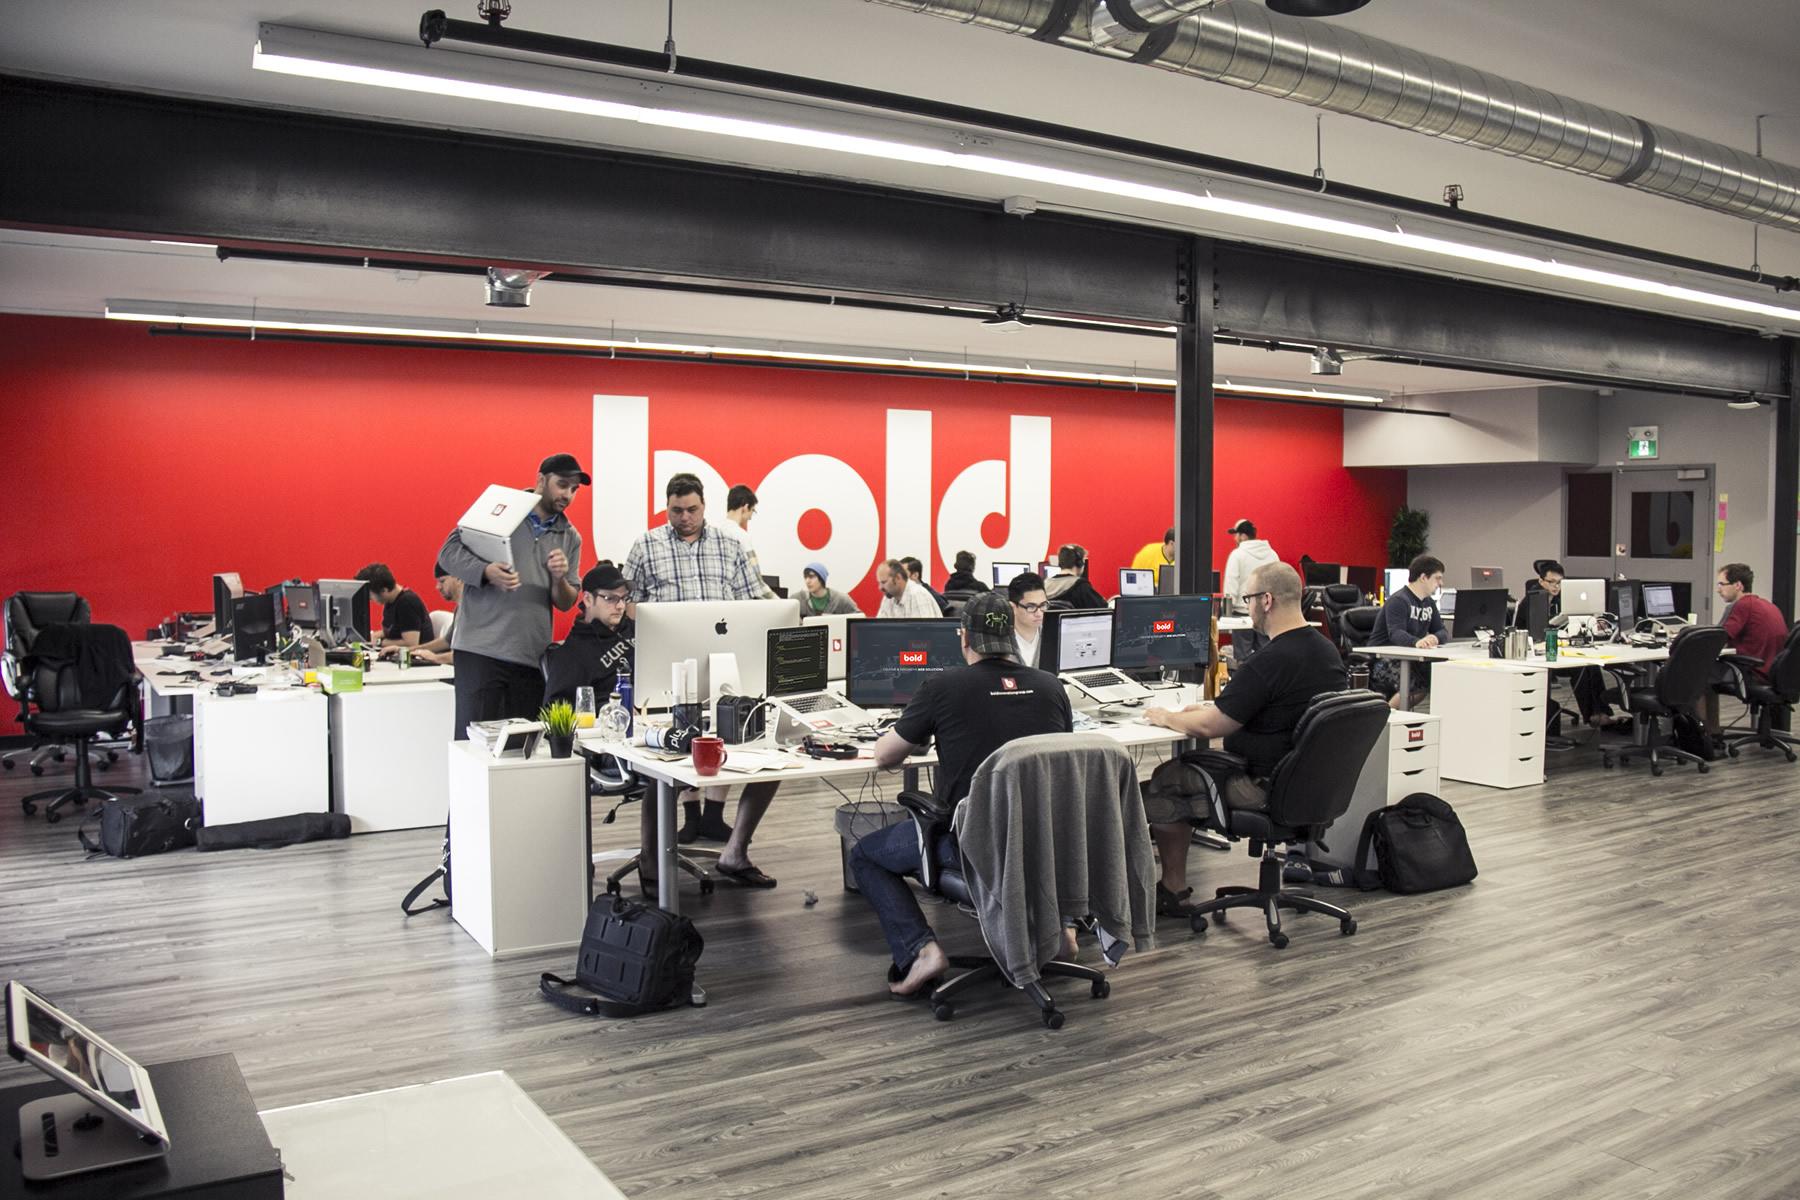 Bold-Office-sm.jpg